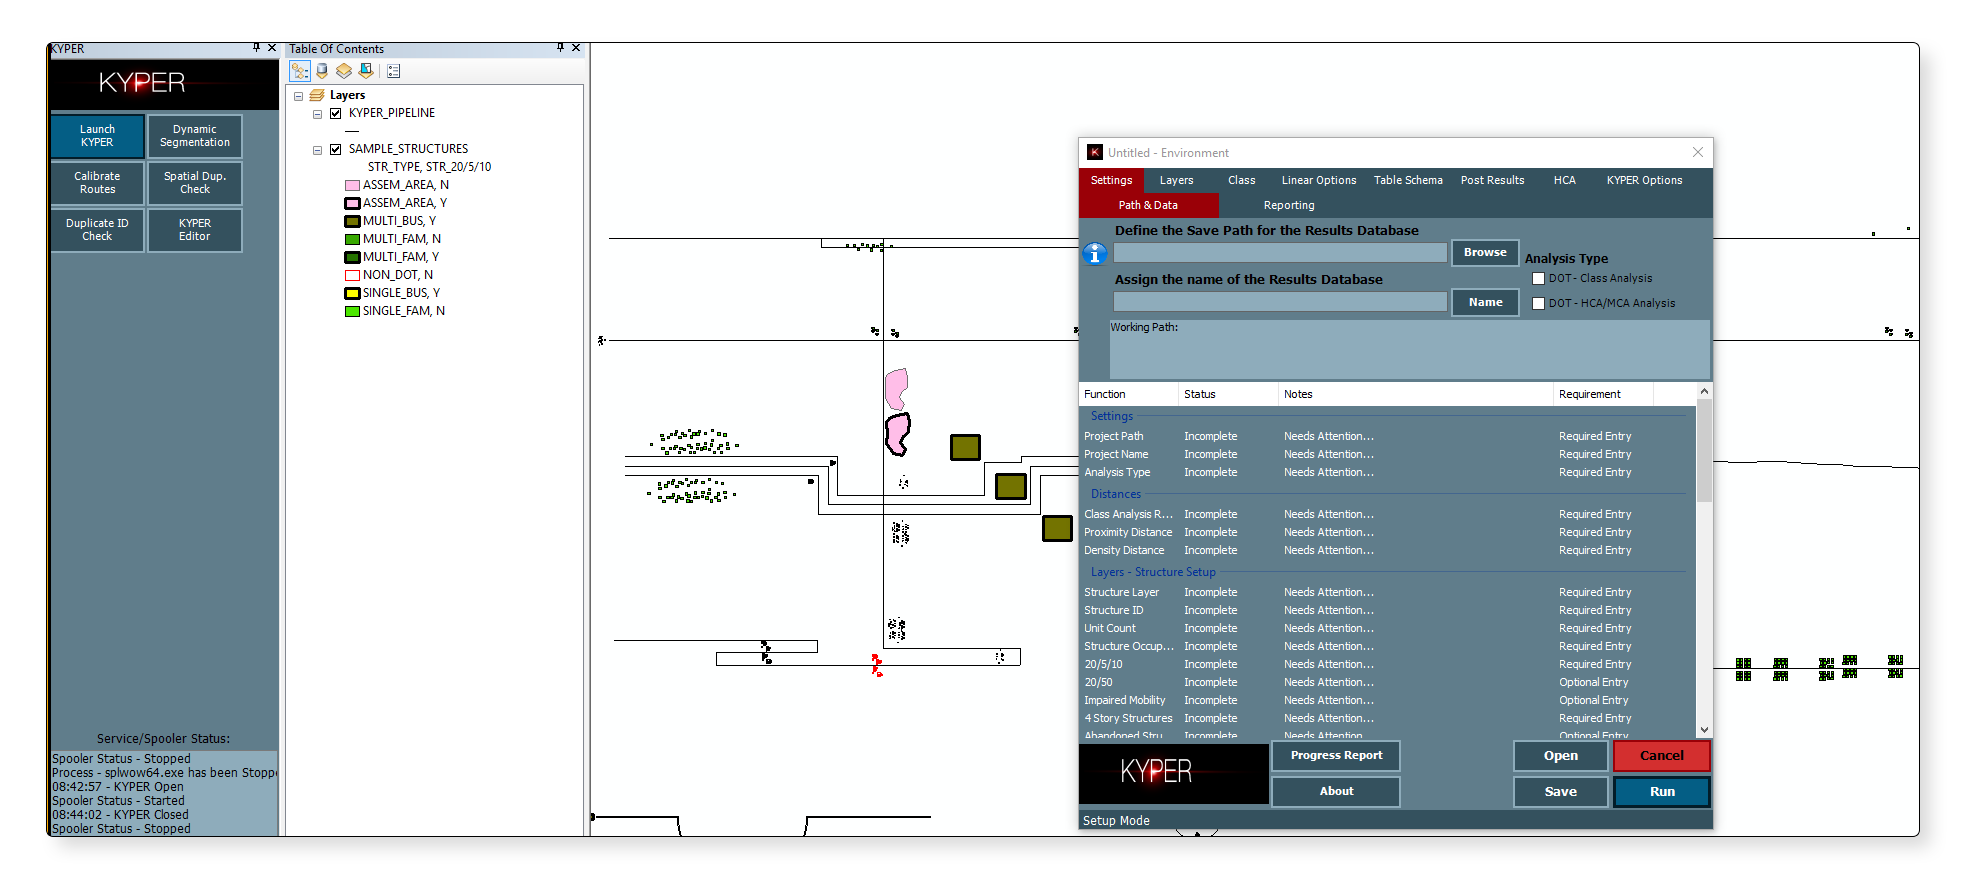 kyper class location hca automation analysis arcmap arcgis pipeline lightning blue sky evolution